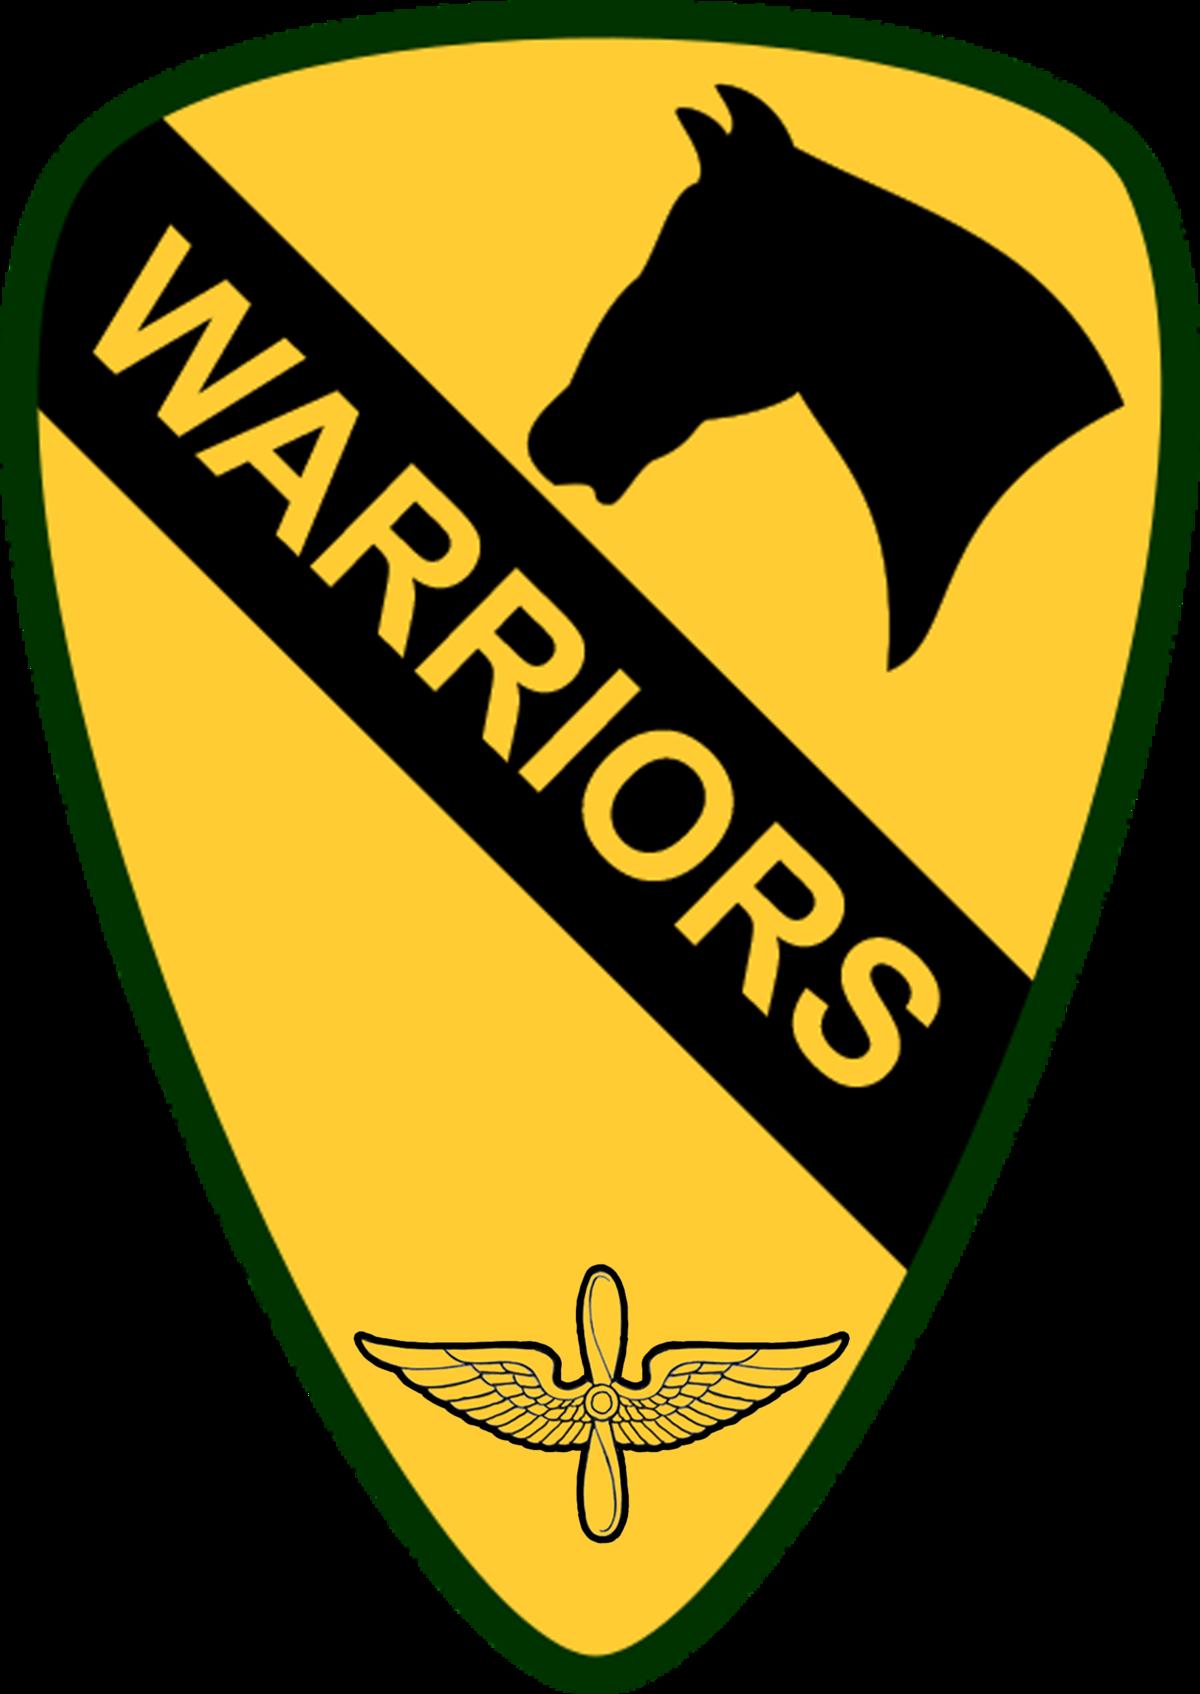 combat aviation brigade 1st cavalry division wikipedia